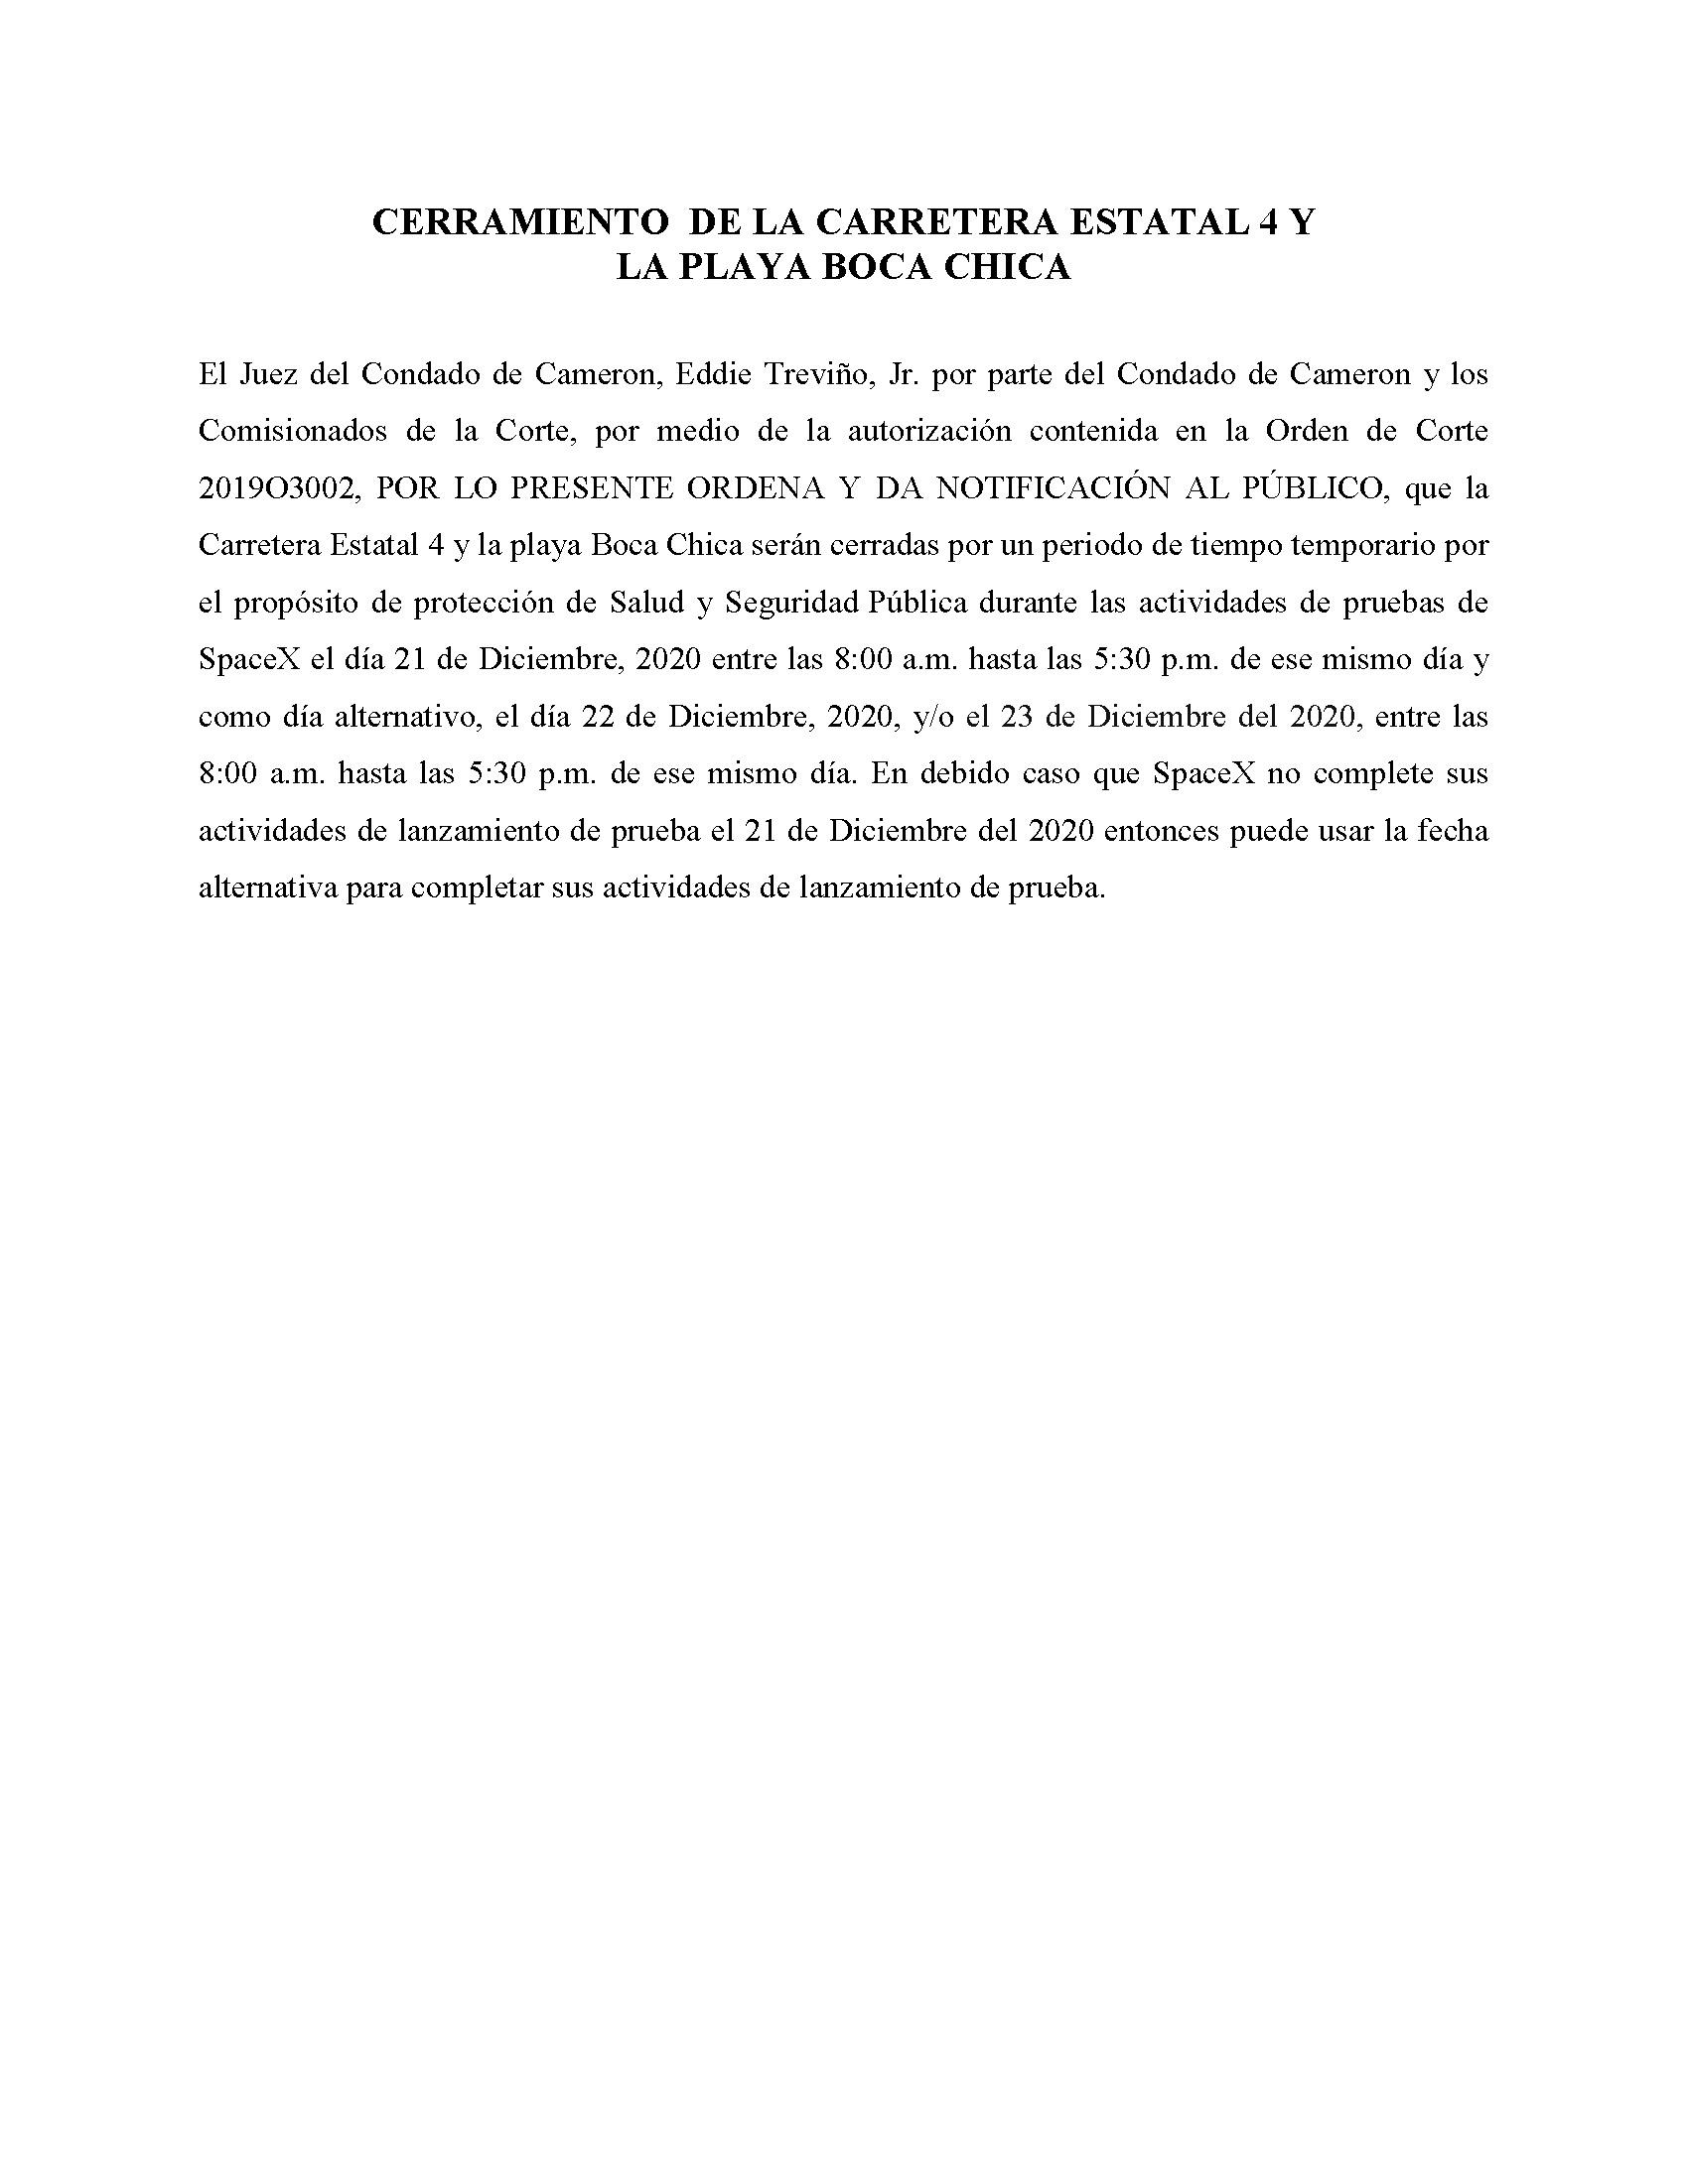 ORDER.CLOSURE OF HIGHWAY 4 Y LA PLAYA BOCA CHICA.SPANISH.12.21.20